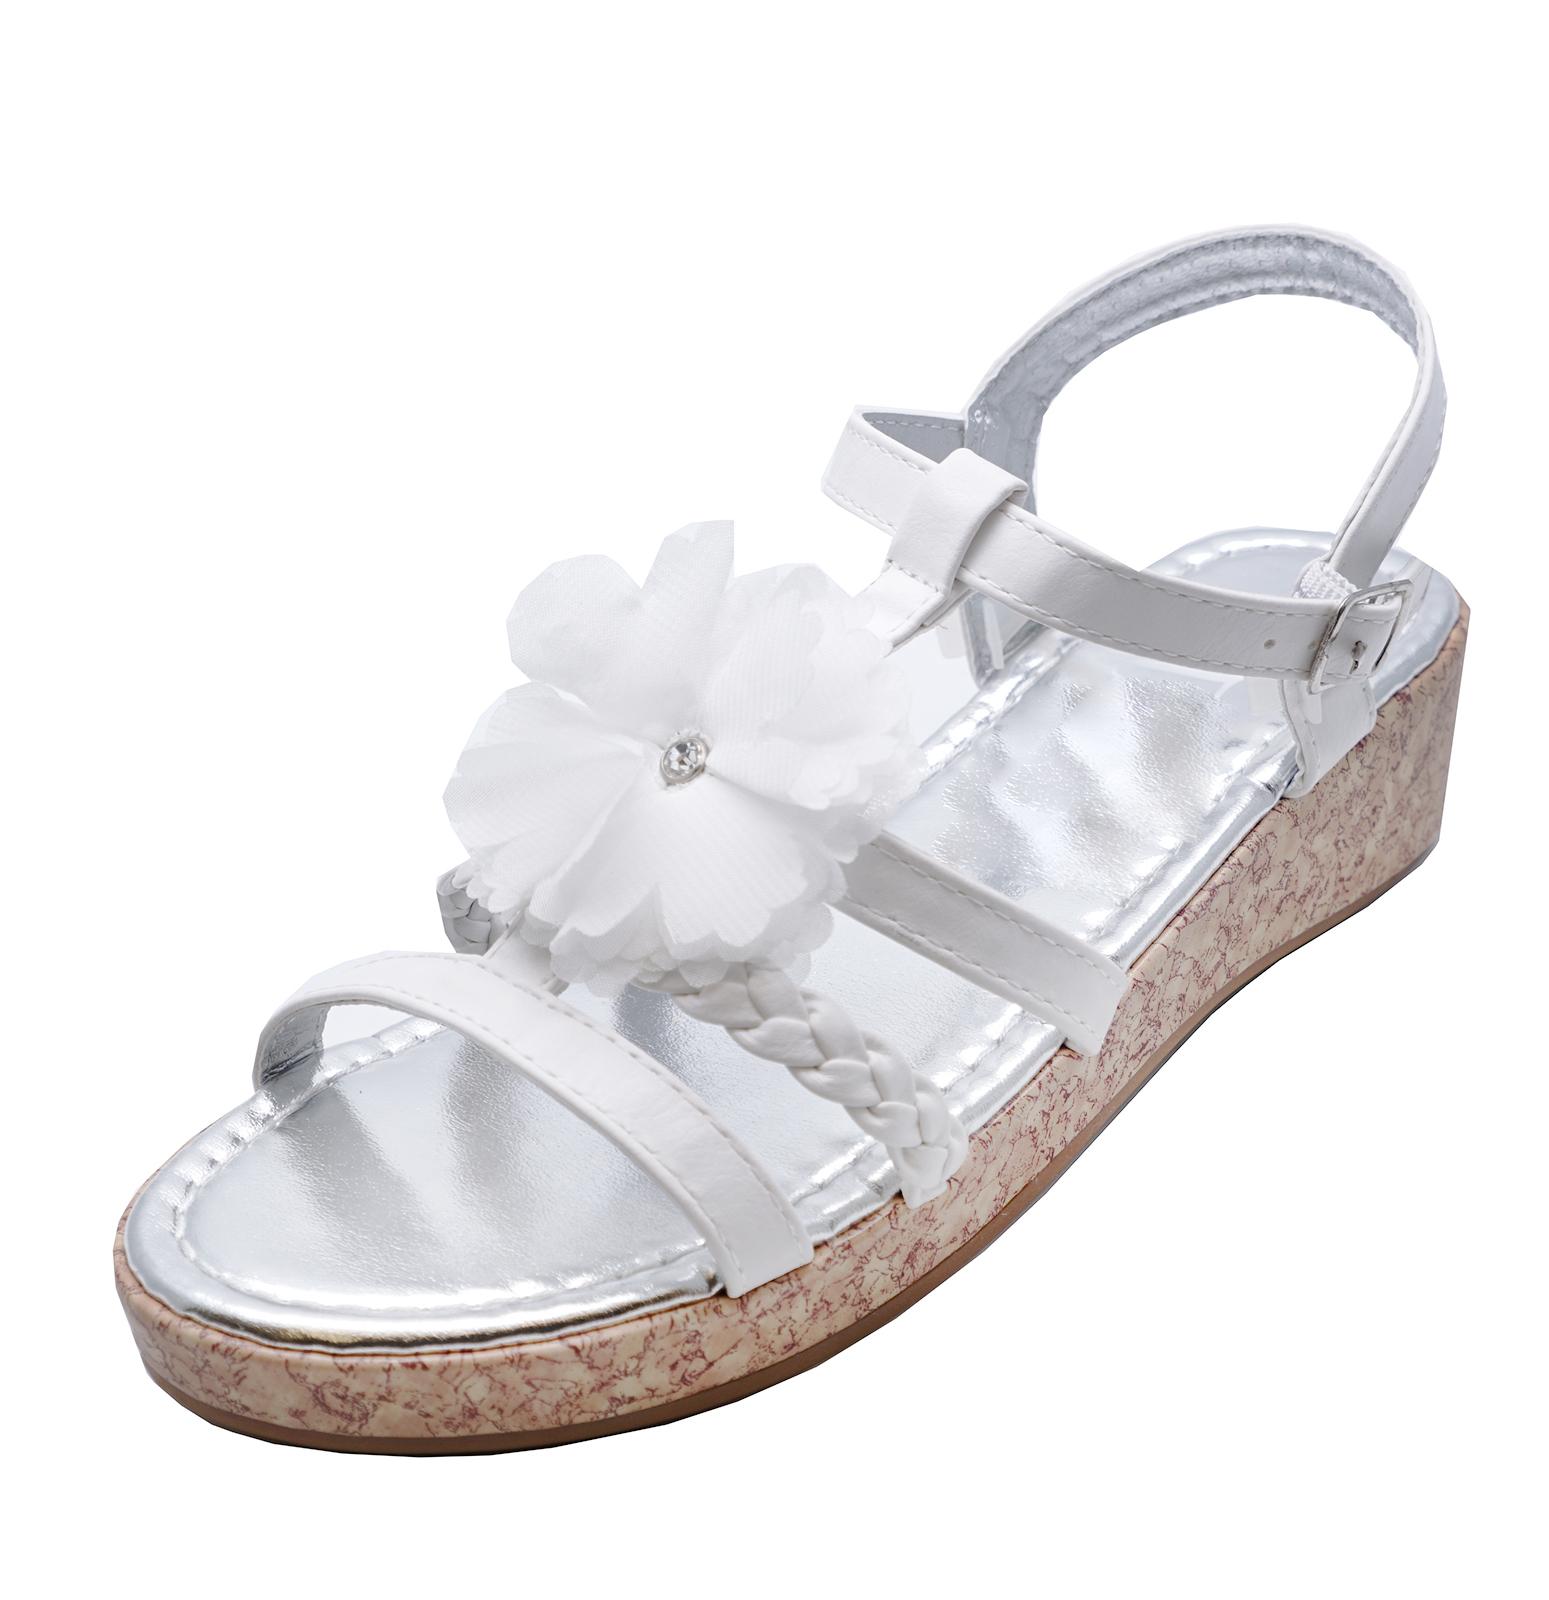 b854492c65ae Sentinel KIDS GIRLS CHILDRENS WHITE FLOWER WEDGE SANDALS SUMMER HOLIDAY  SHOES SIZES 8-4